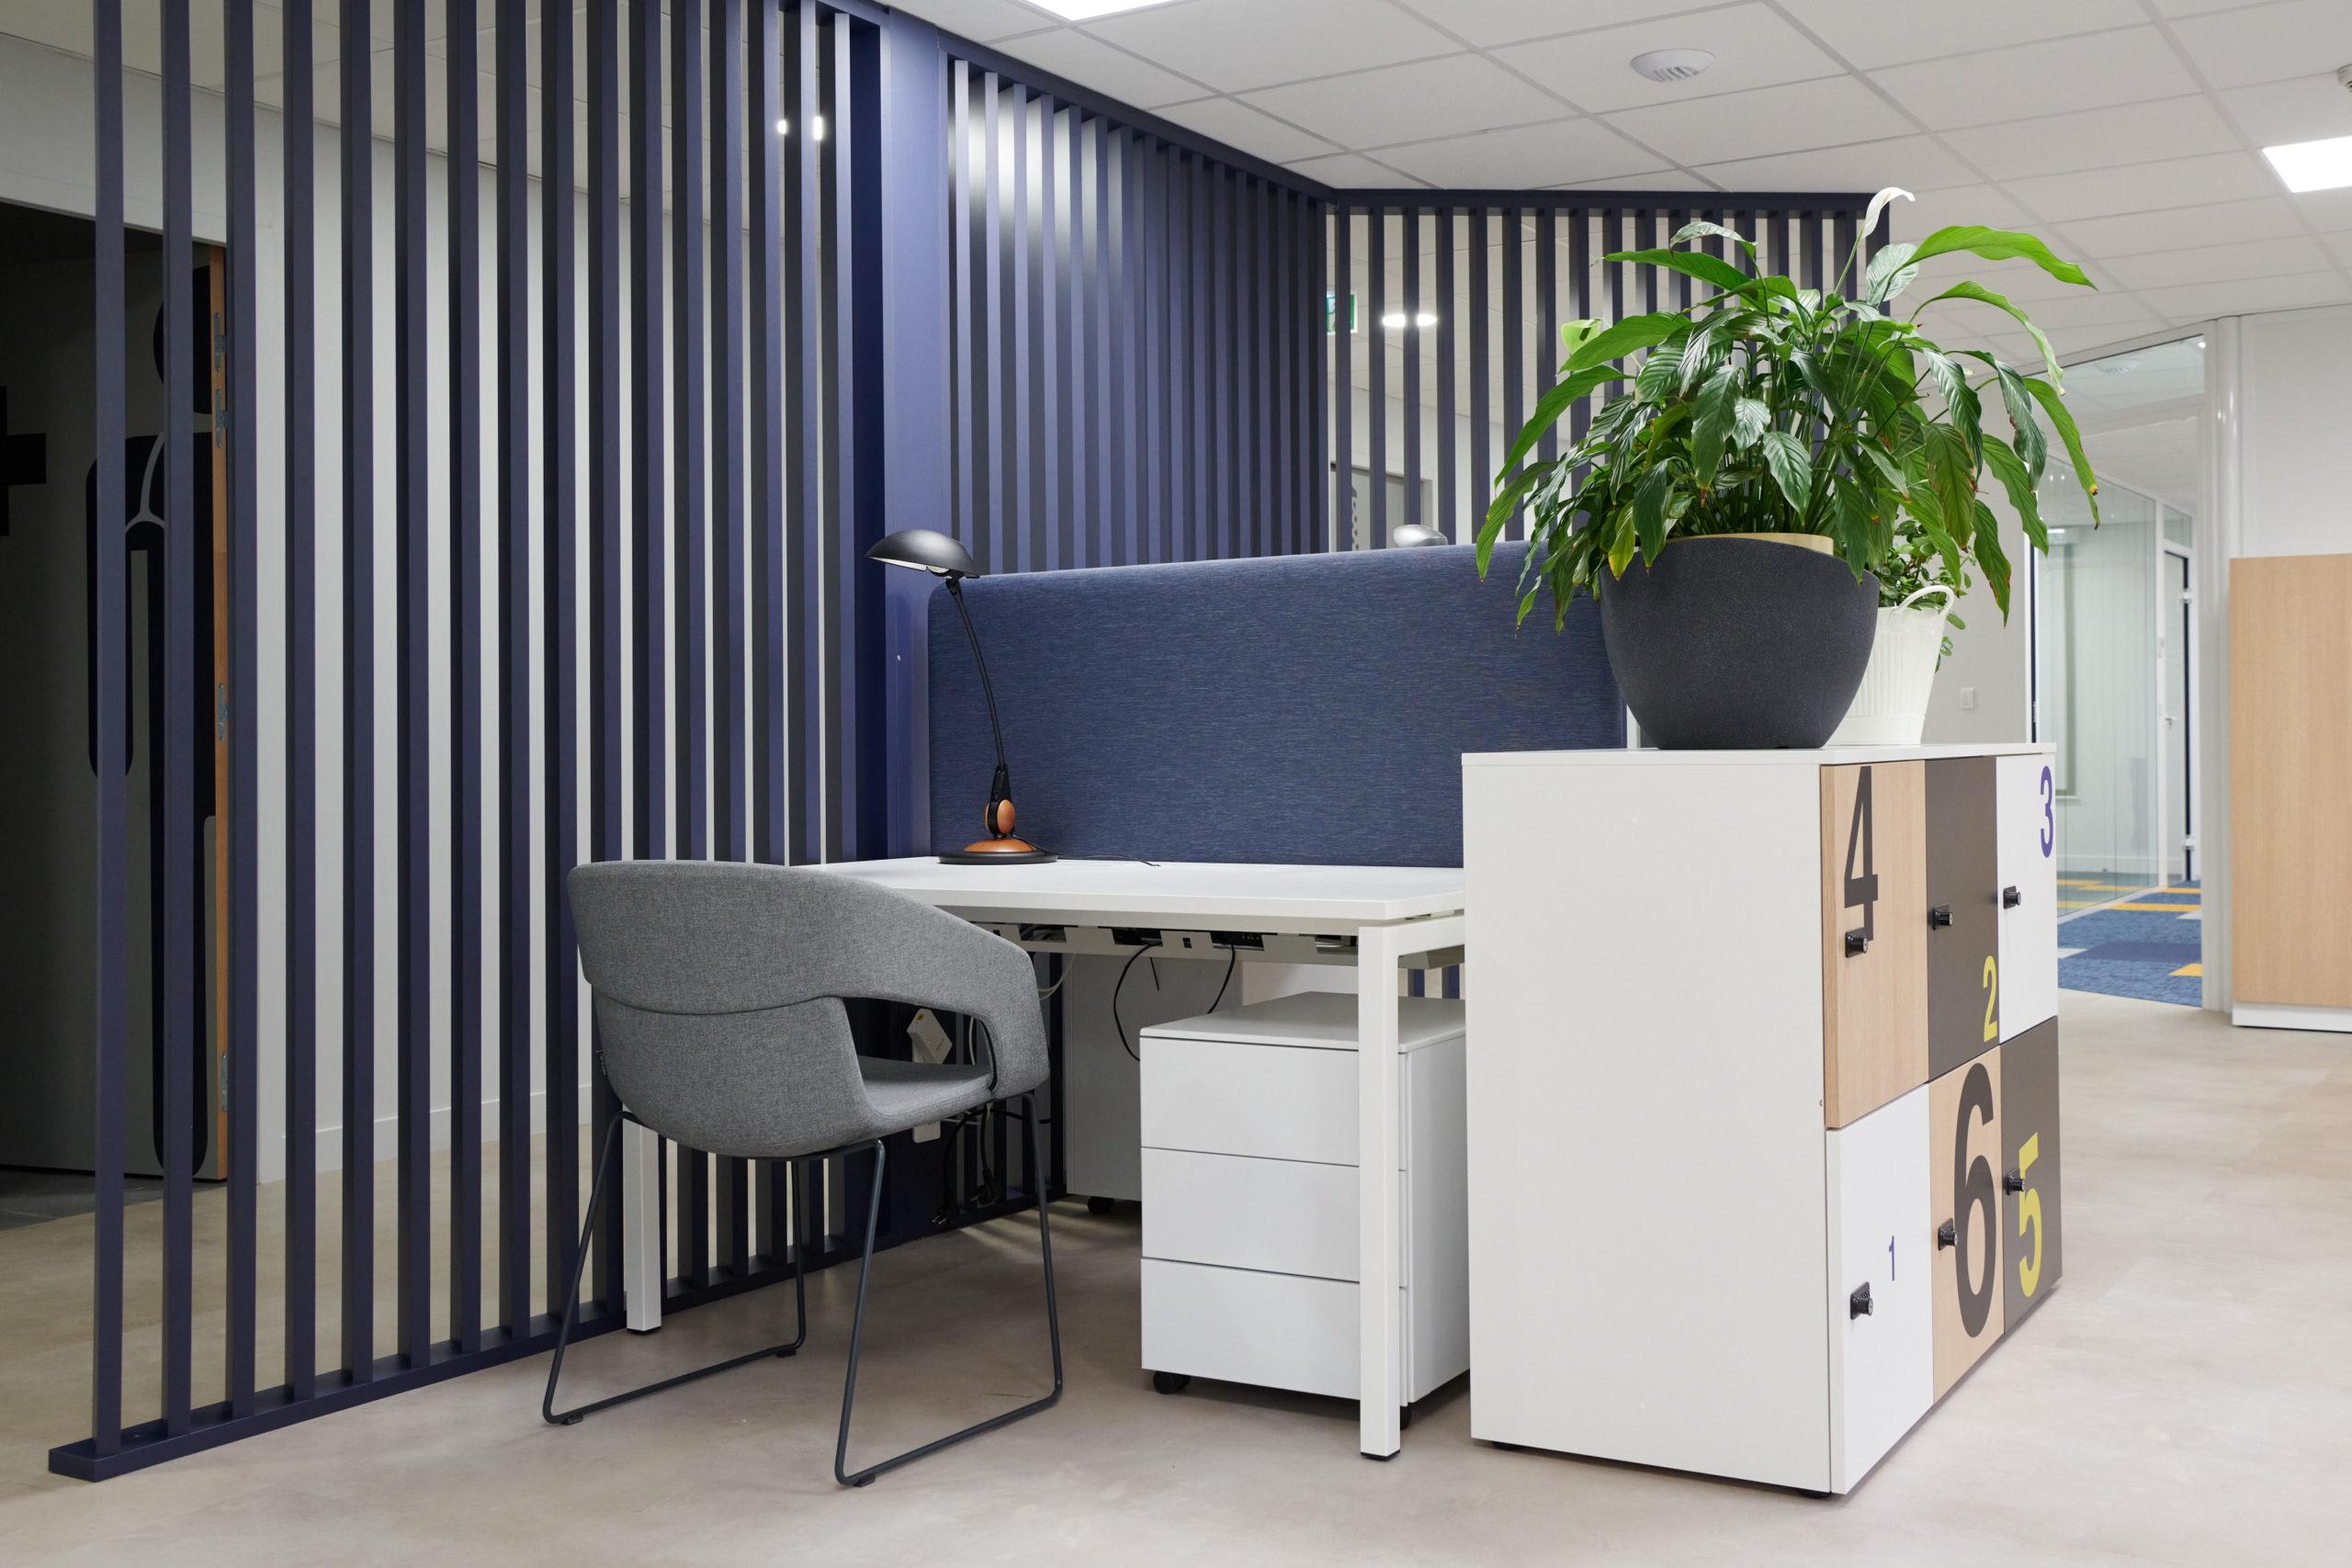 Hoya-bureau-fauteuil-casiers-claustra